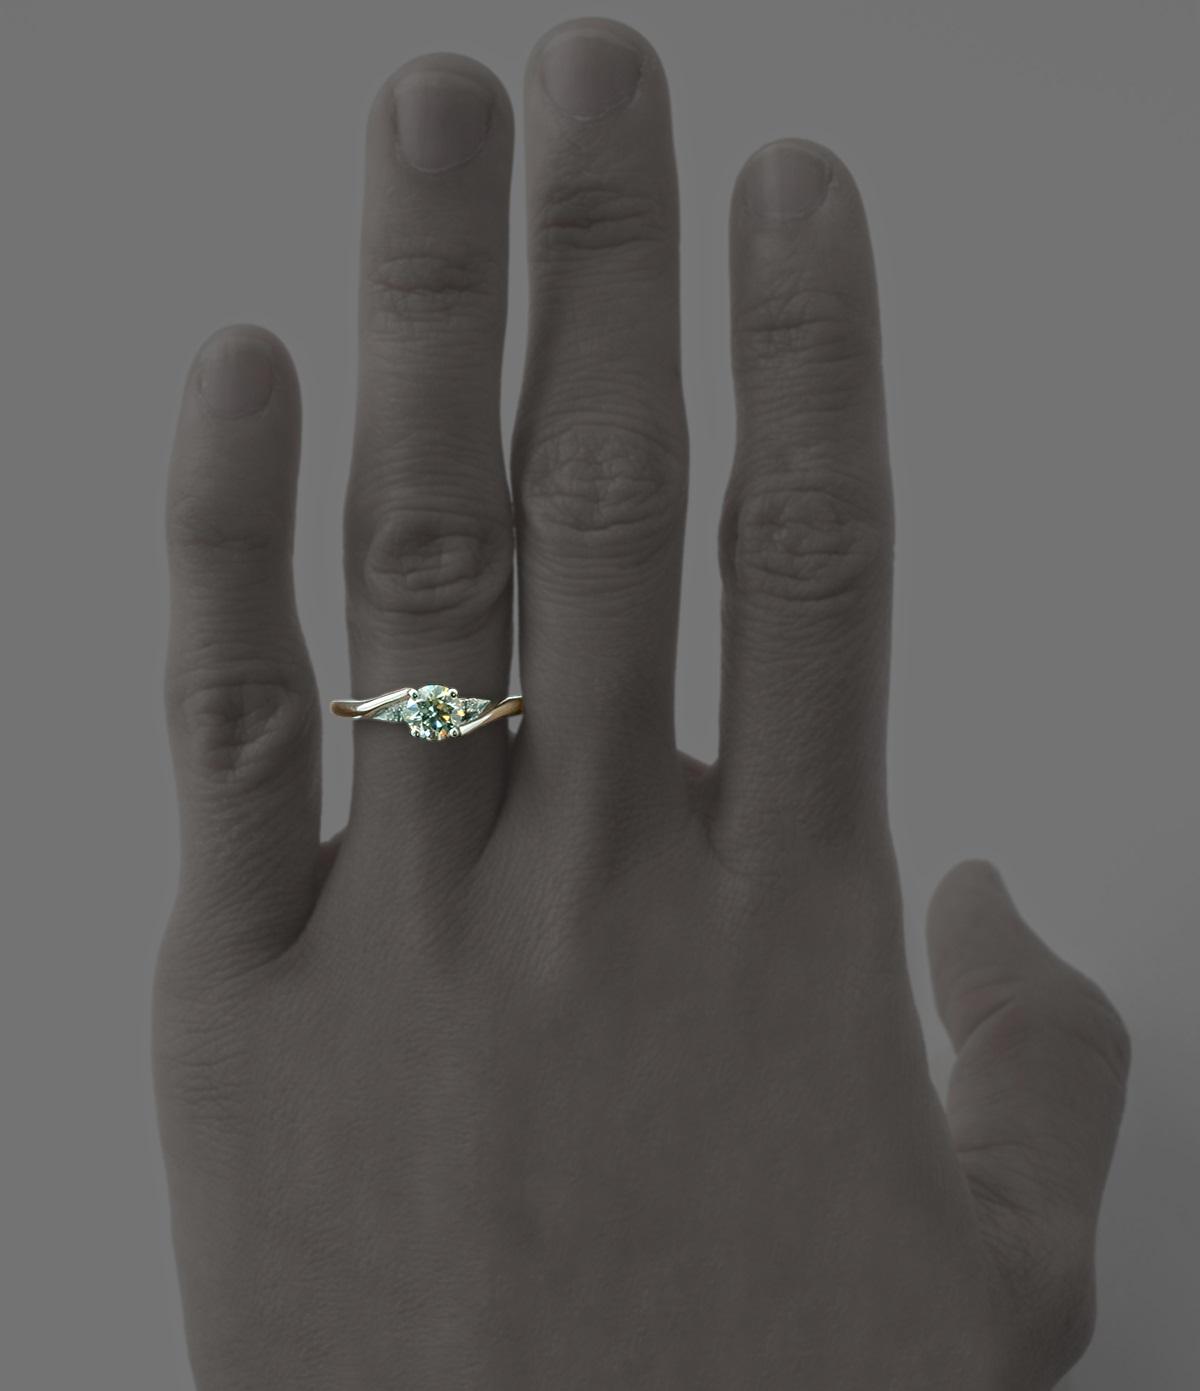 kiss ring worn